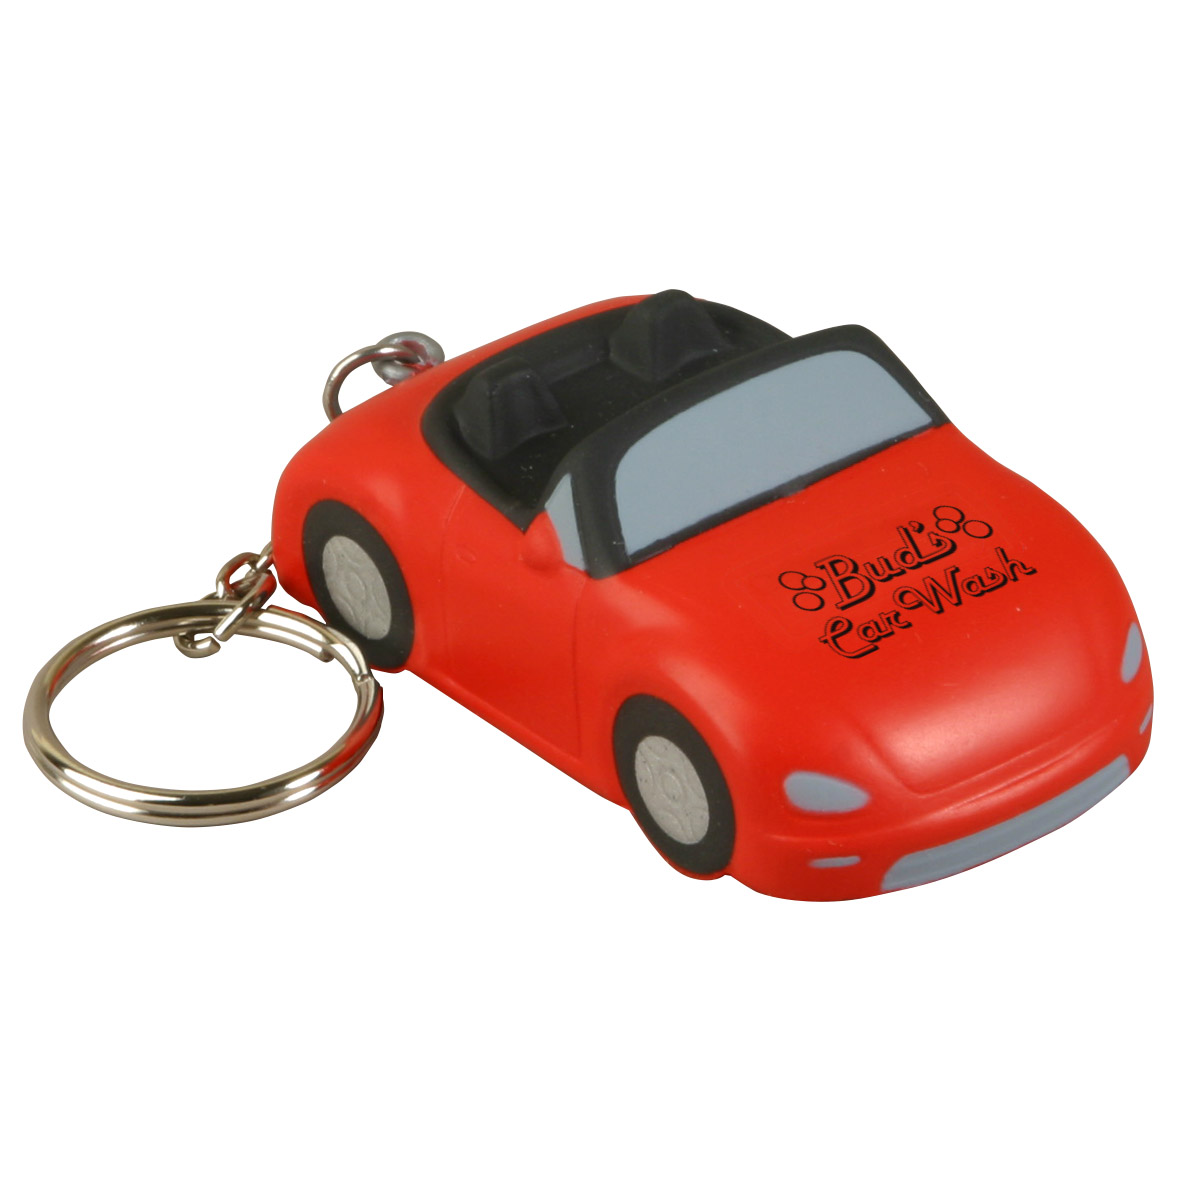 Convertible Car Stress Reliever Key Chain, LKC-CV33, 1 Colour Imprint